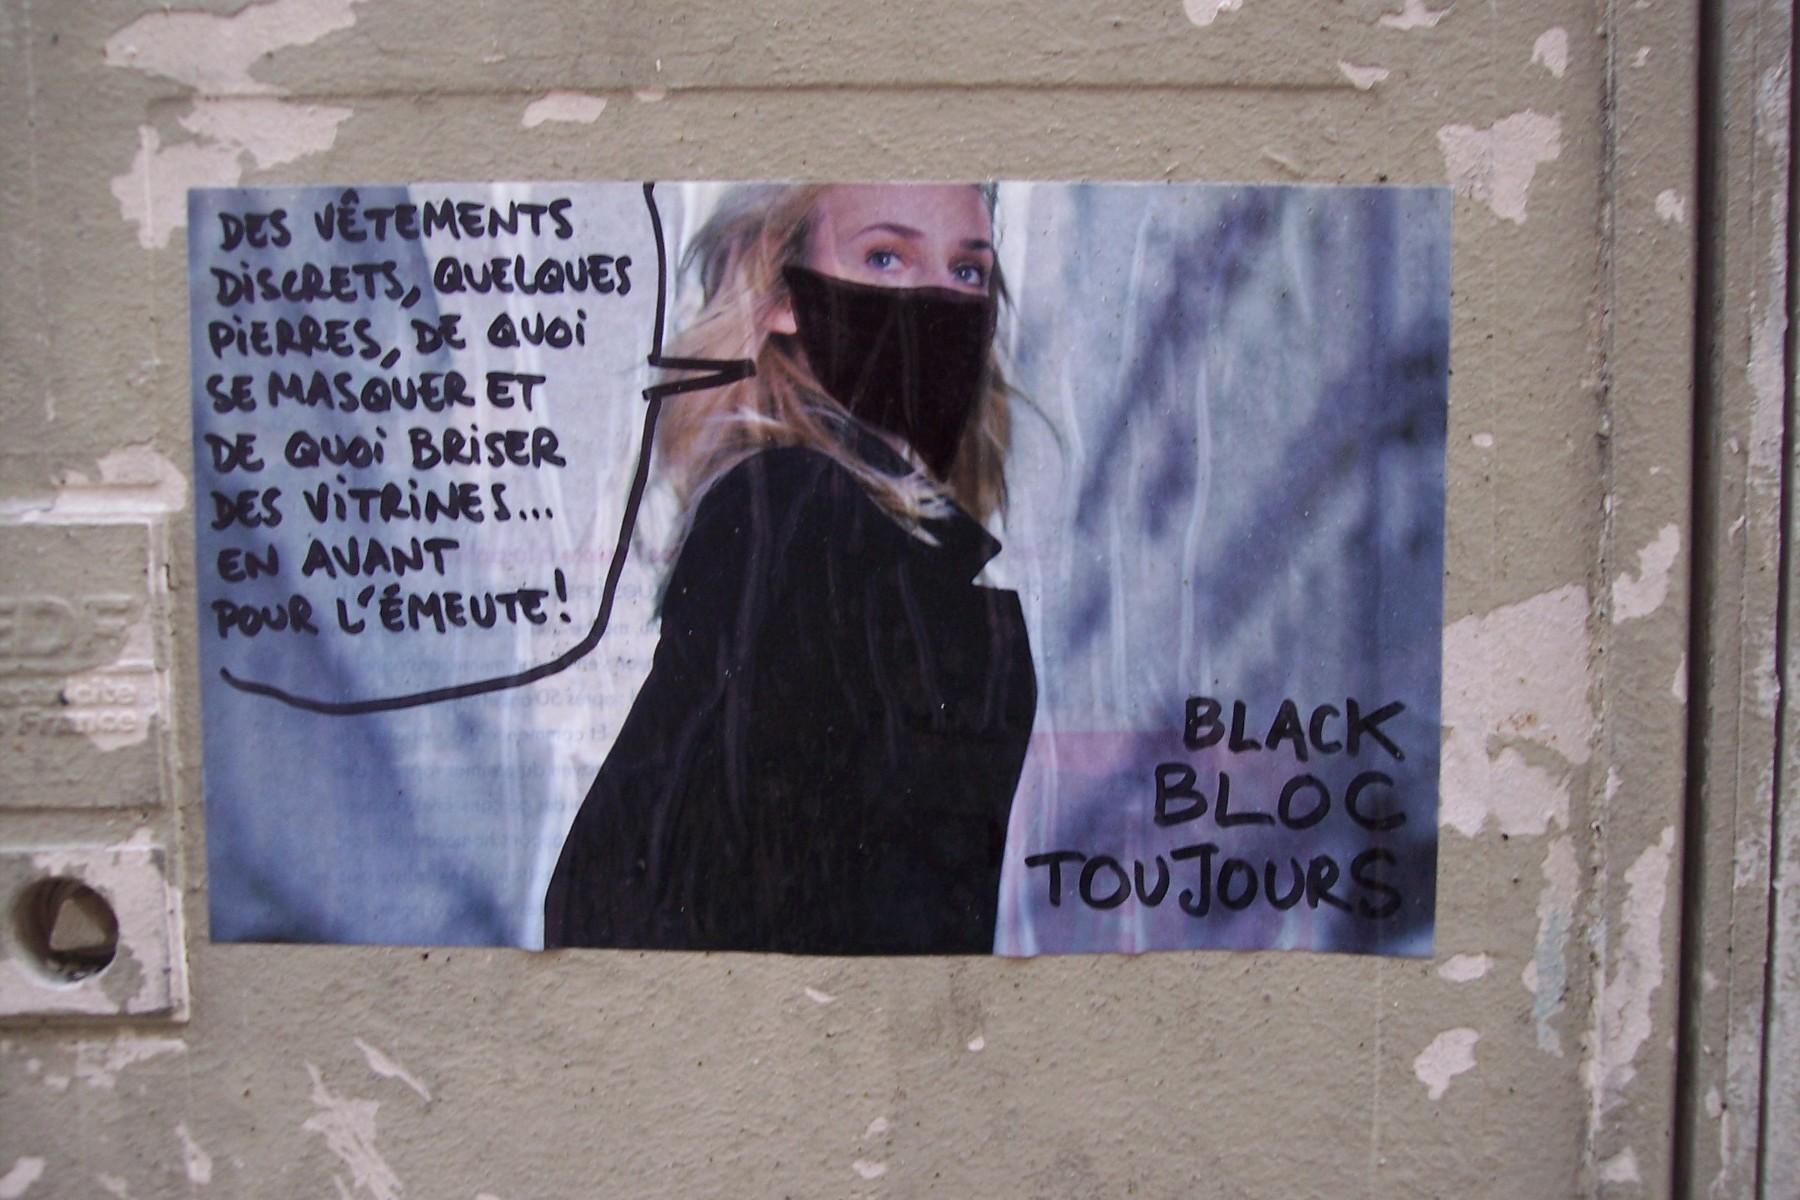 http://juralib.noblogs.org/files/2012/09/2012-07-16_Dijon_RueDesBonsEnfants-b.jpg